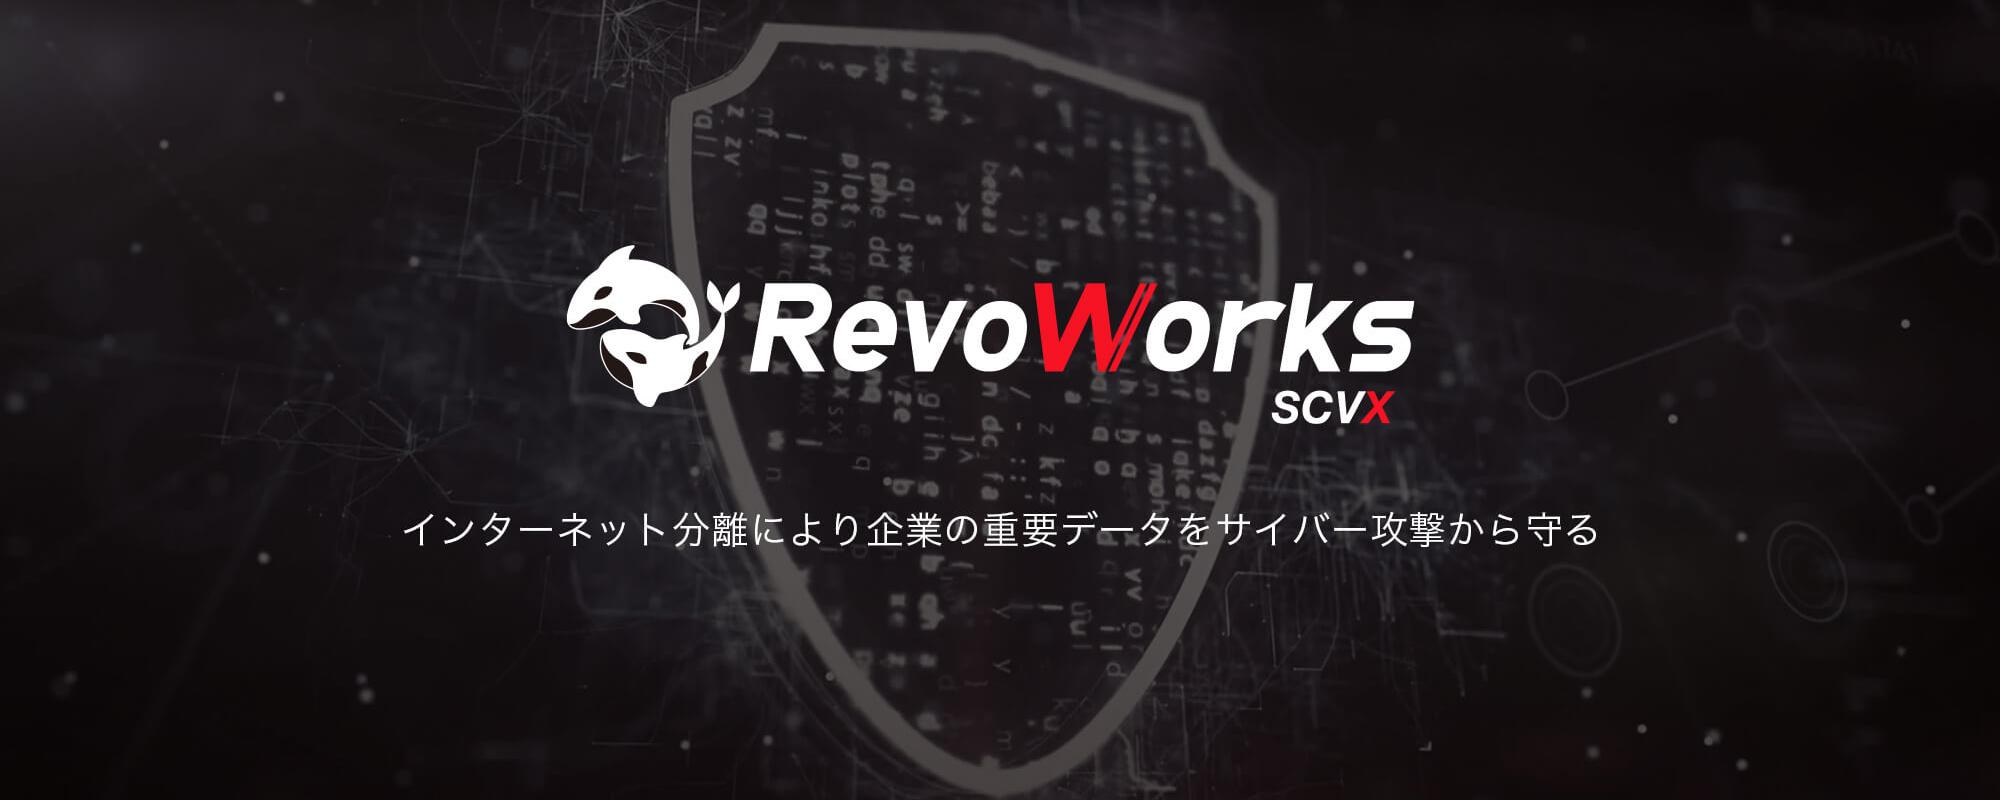 SCVX_003.jpg